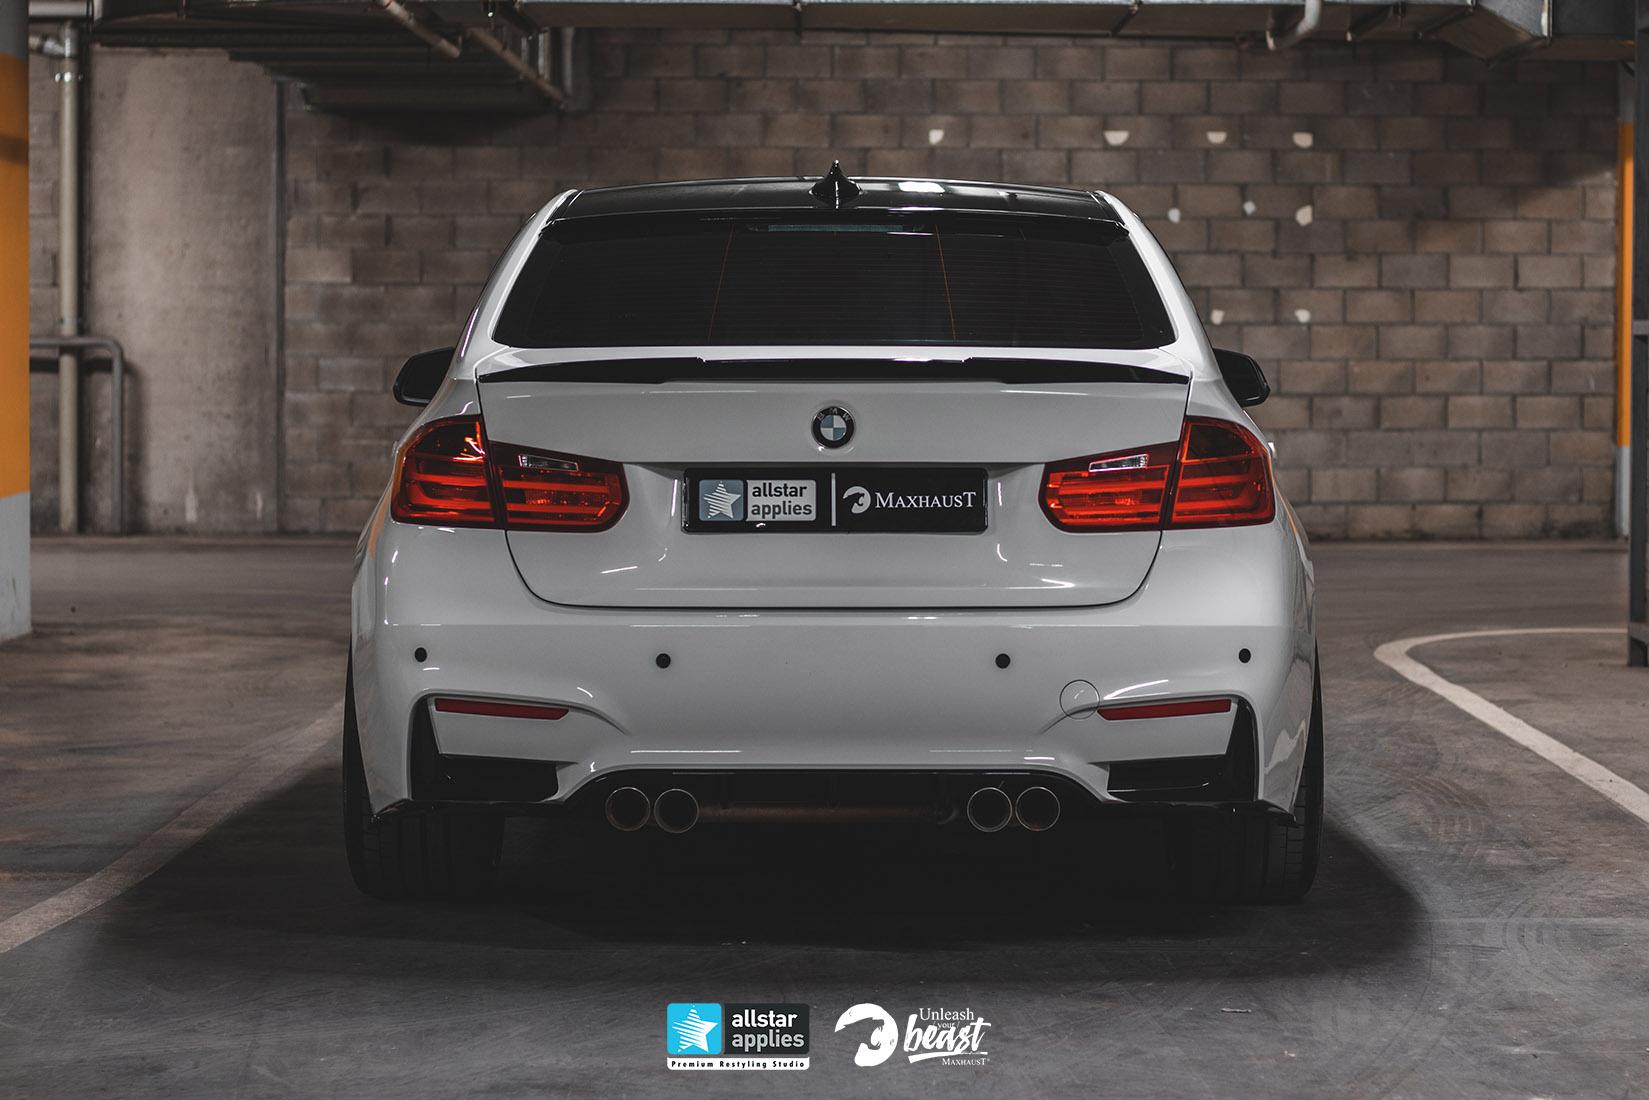 BMW 3 SERIES MAXHAUST 1